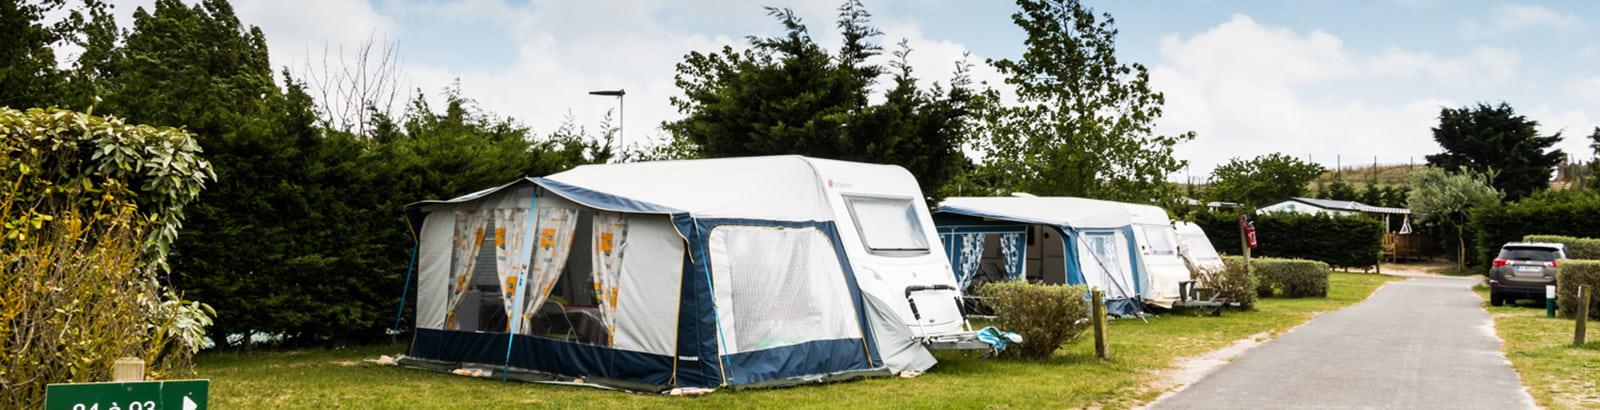 Camping Caravanile : ©campingcaravanile Location Emplacement 2